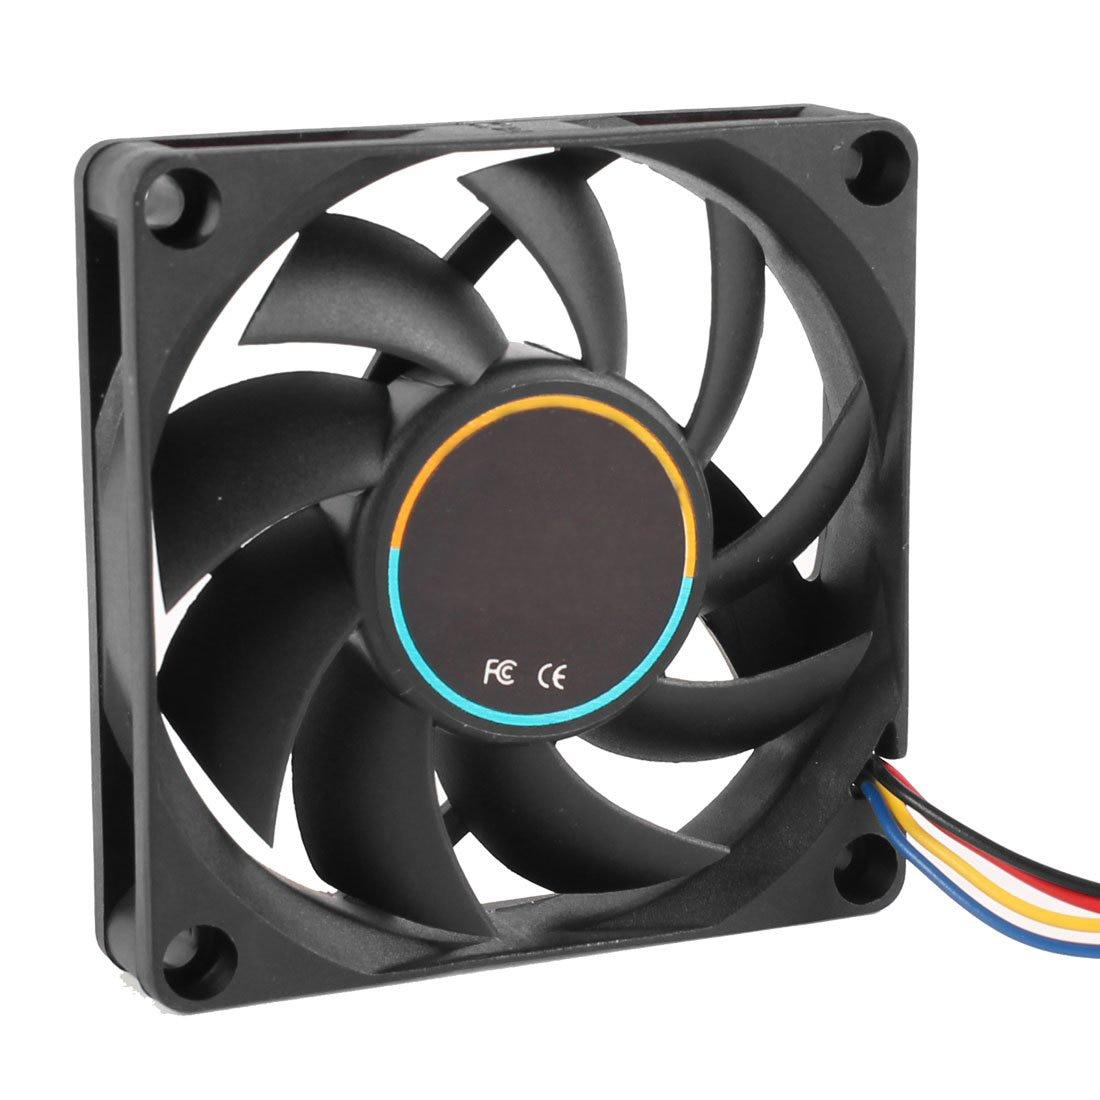 70x70x15mm 12V 4 Pins PWM PC Computer Case CPU Cooler Cooling Fan Black aerocool 15 blade 1 56w mute model computer cpu cooling fan black 12 x 12cm 7v